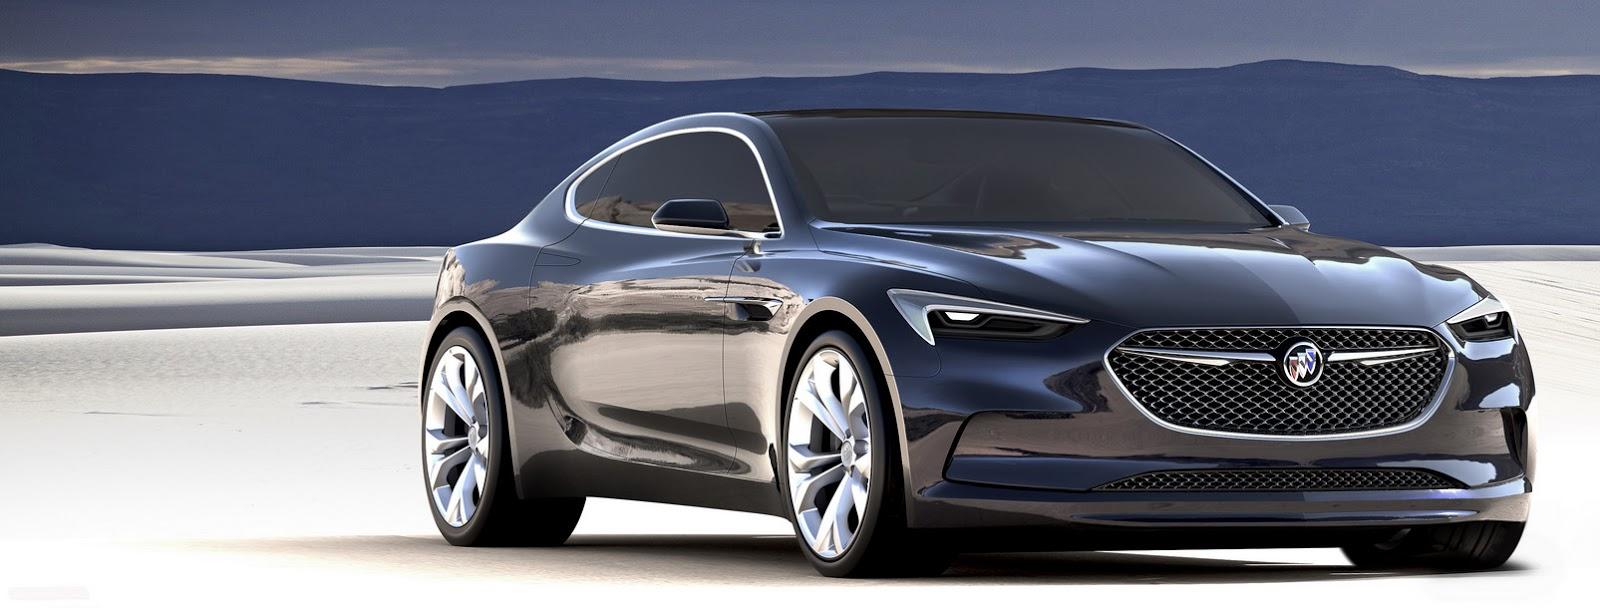 Buick Avista Concept With Twin-Turbo V6 May Hint At ...